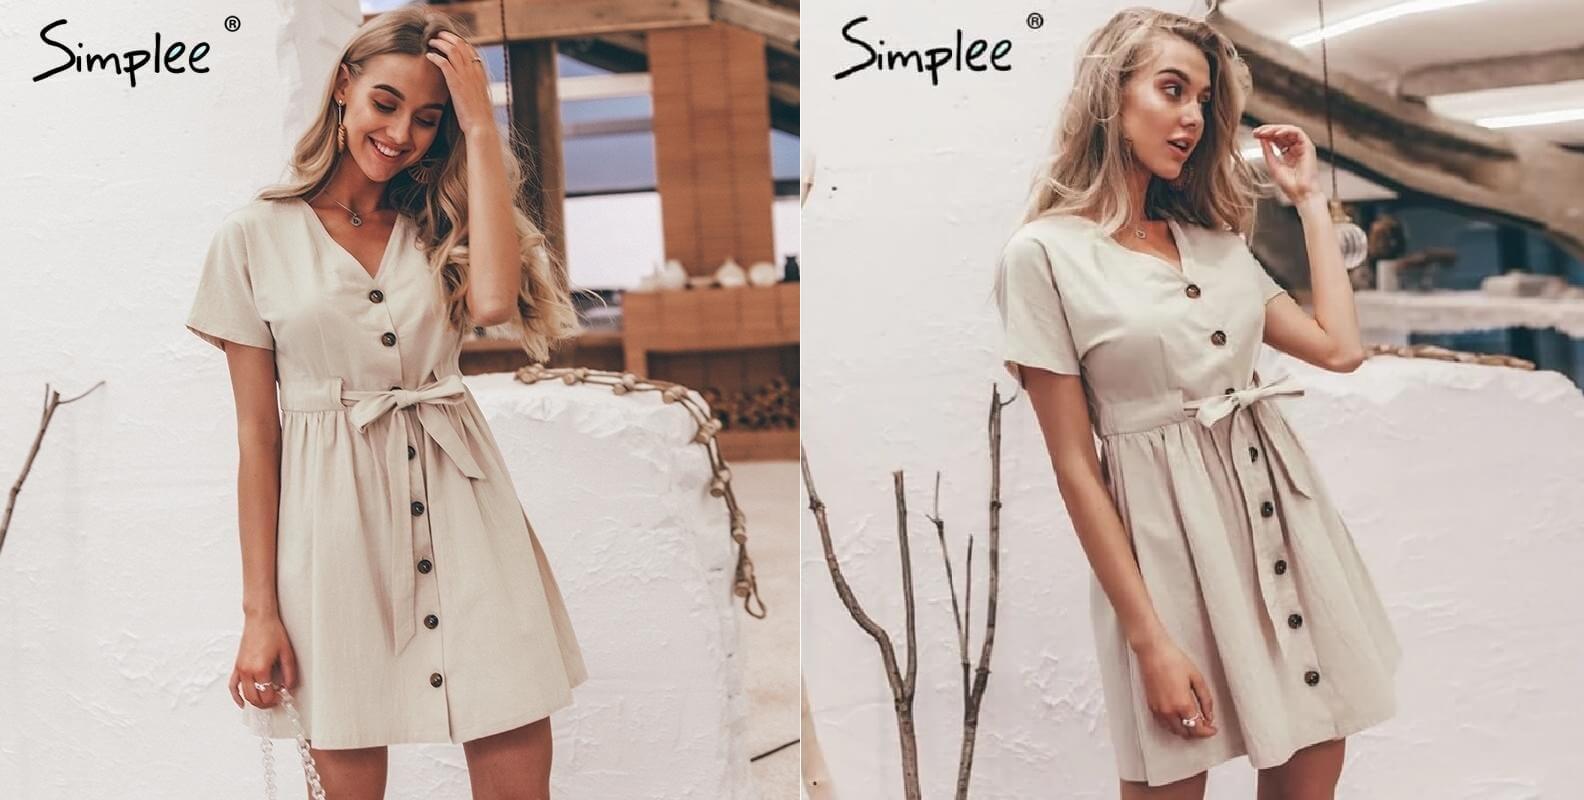 Váy vintage - Nguồn hình: Simplee